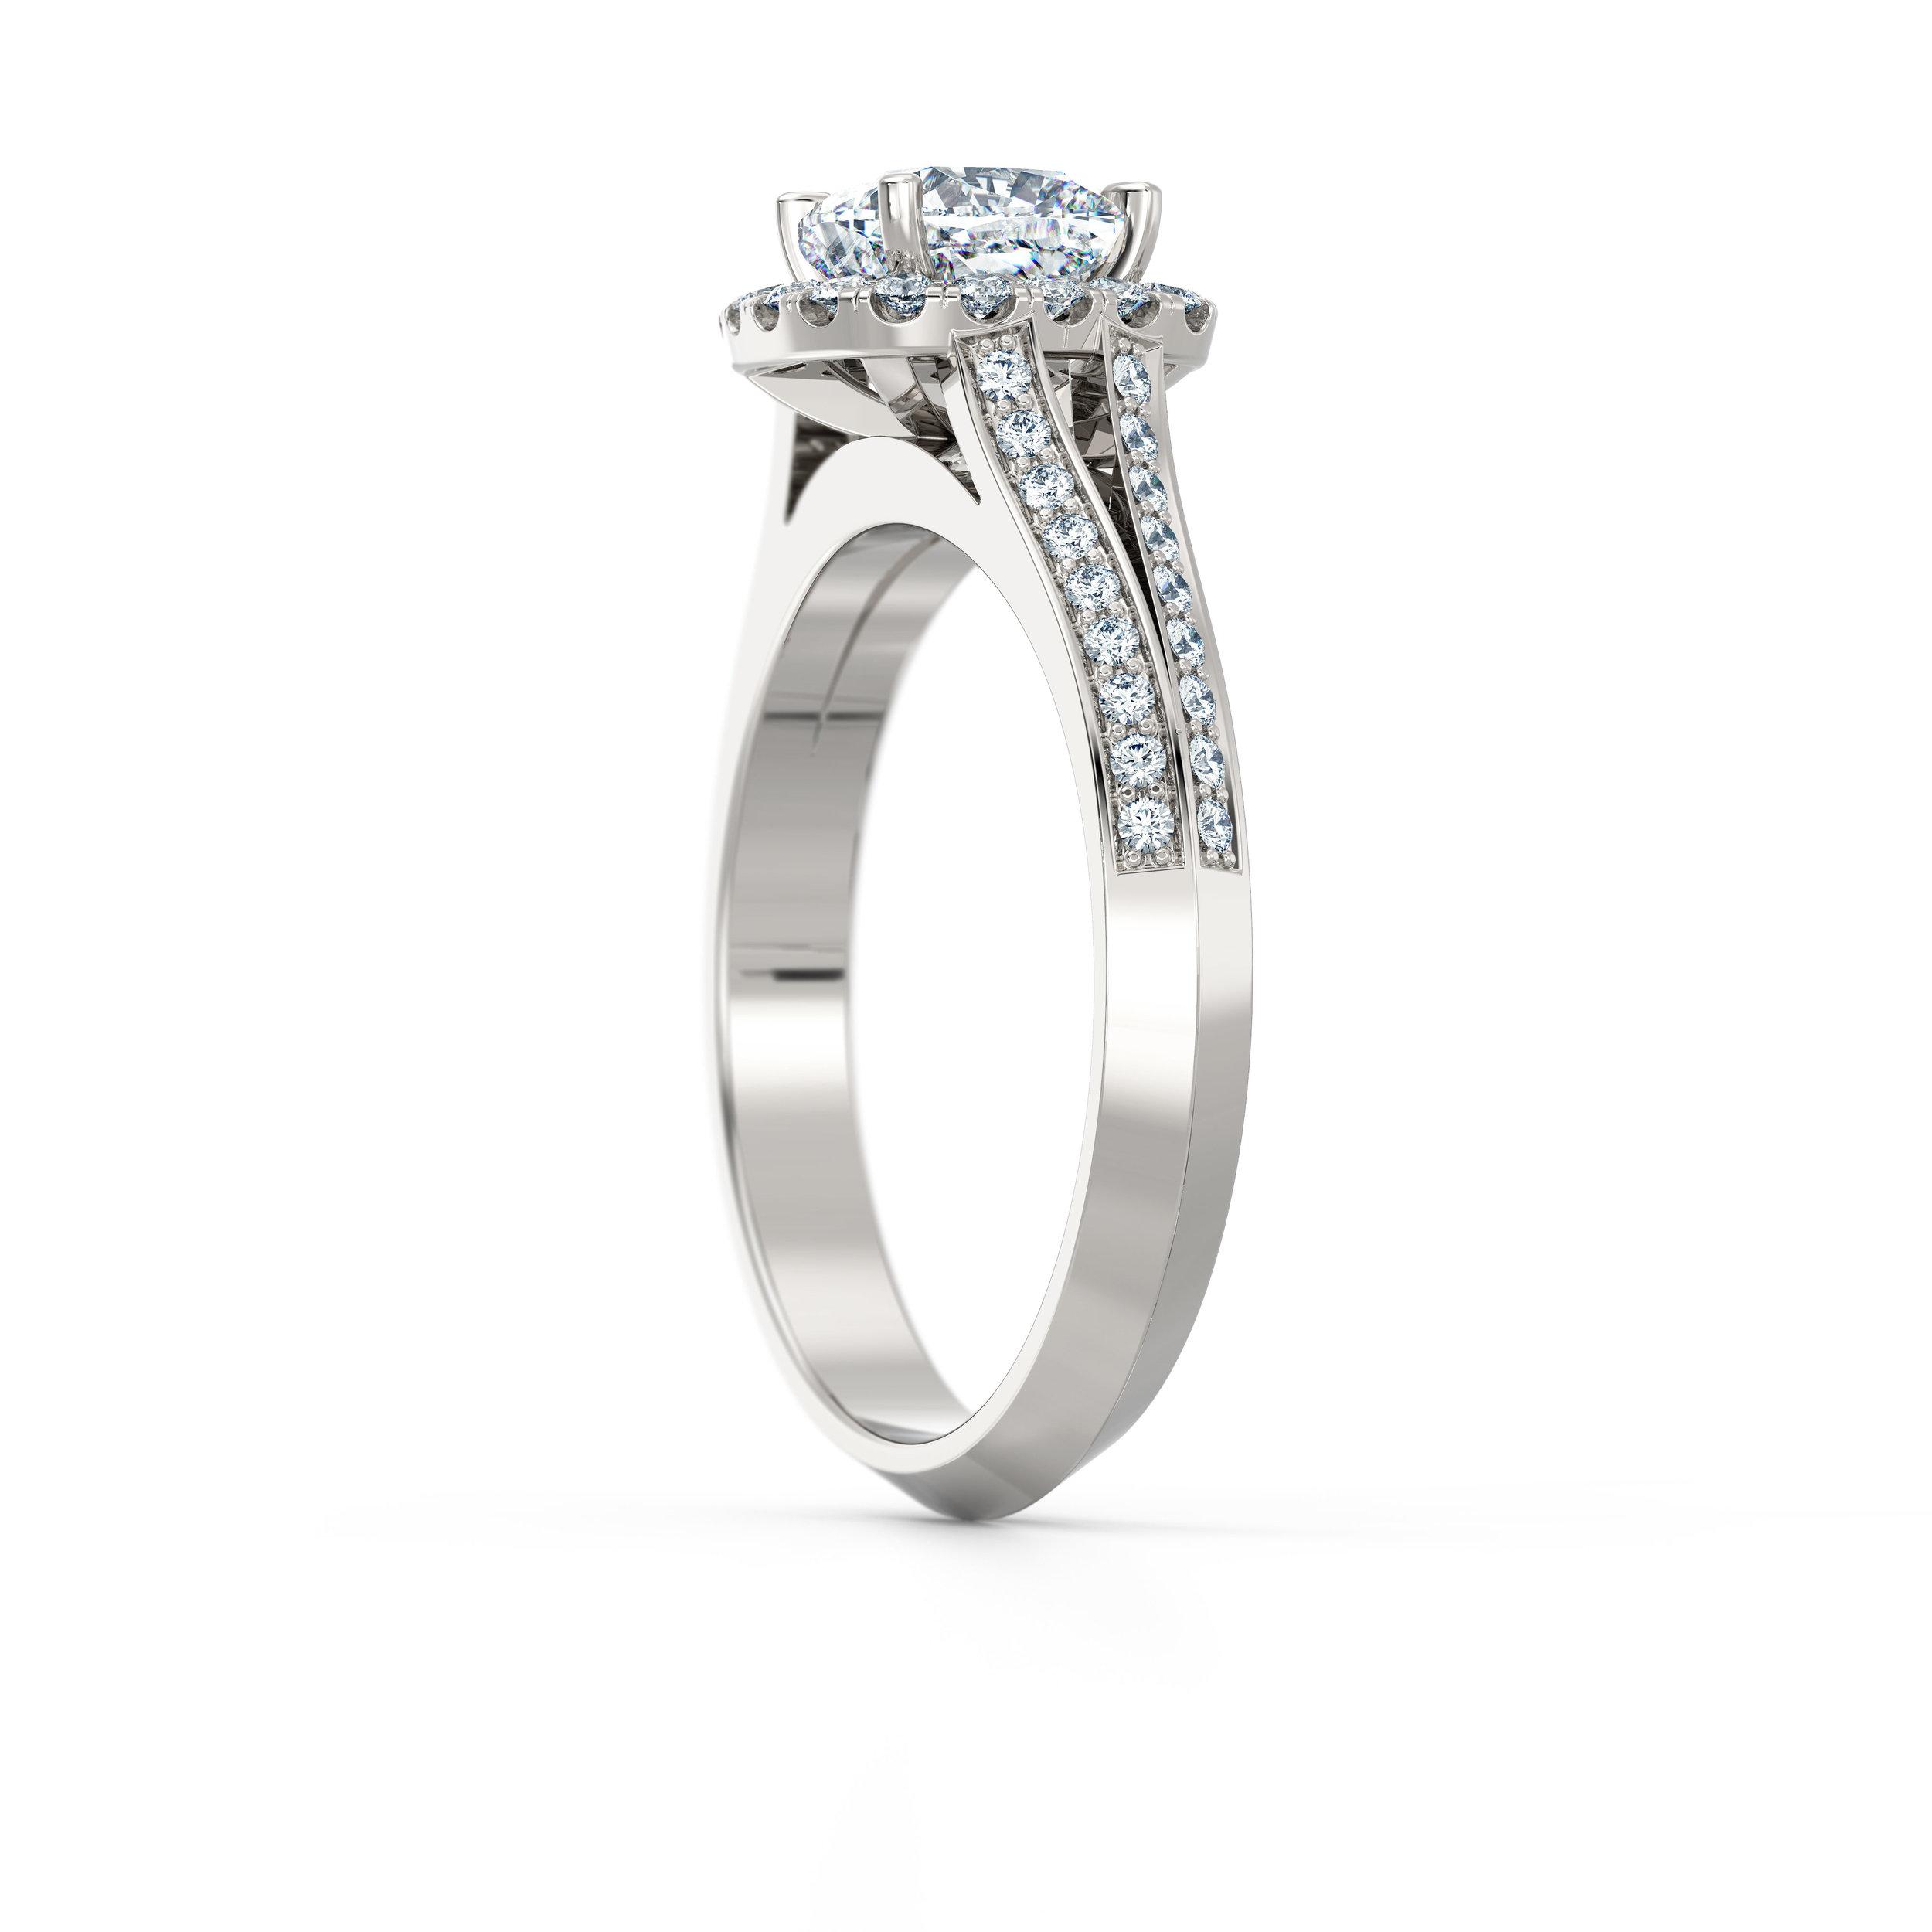 Cushion cut diamond double shank halo engagement ring